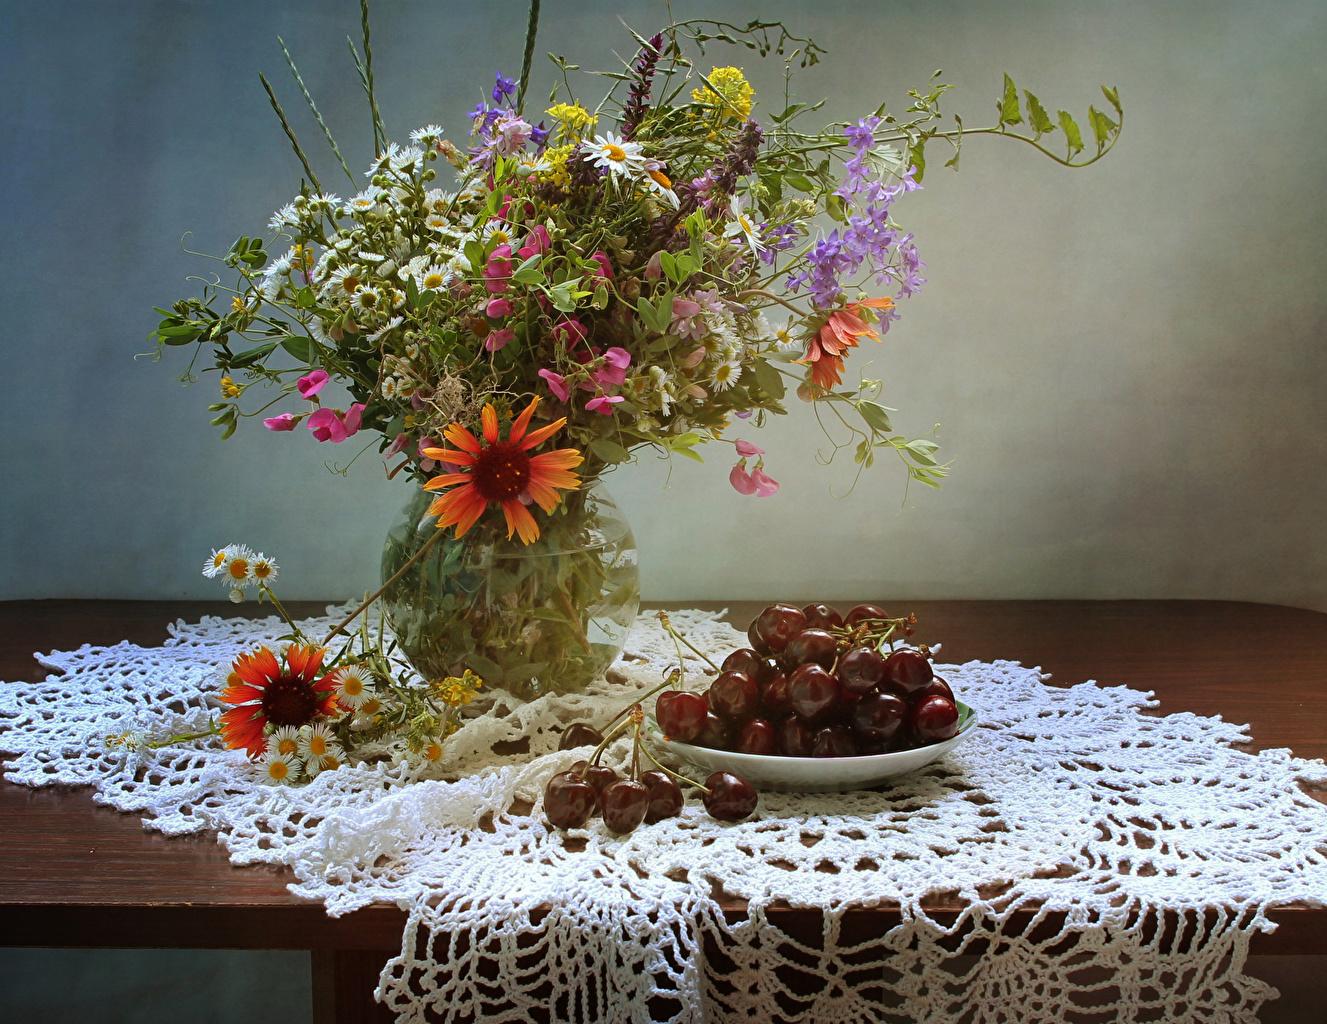 Photos Cherry Gazania Flowers Camomiles Food Vase Cornflowers Still-life flower matricaria Centaurea